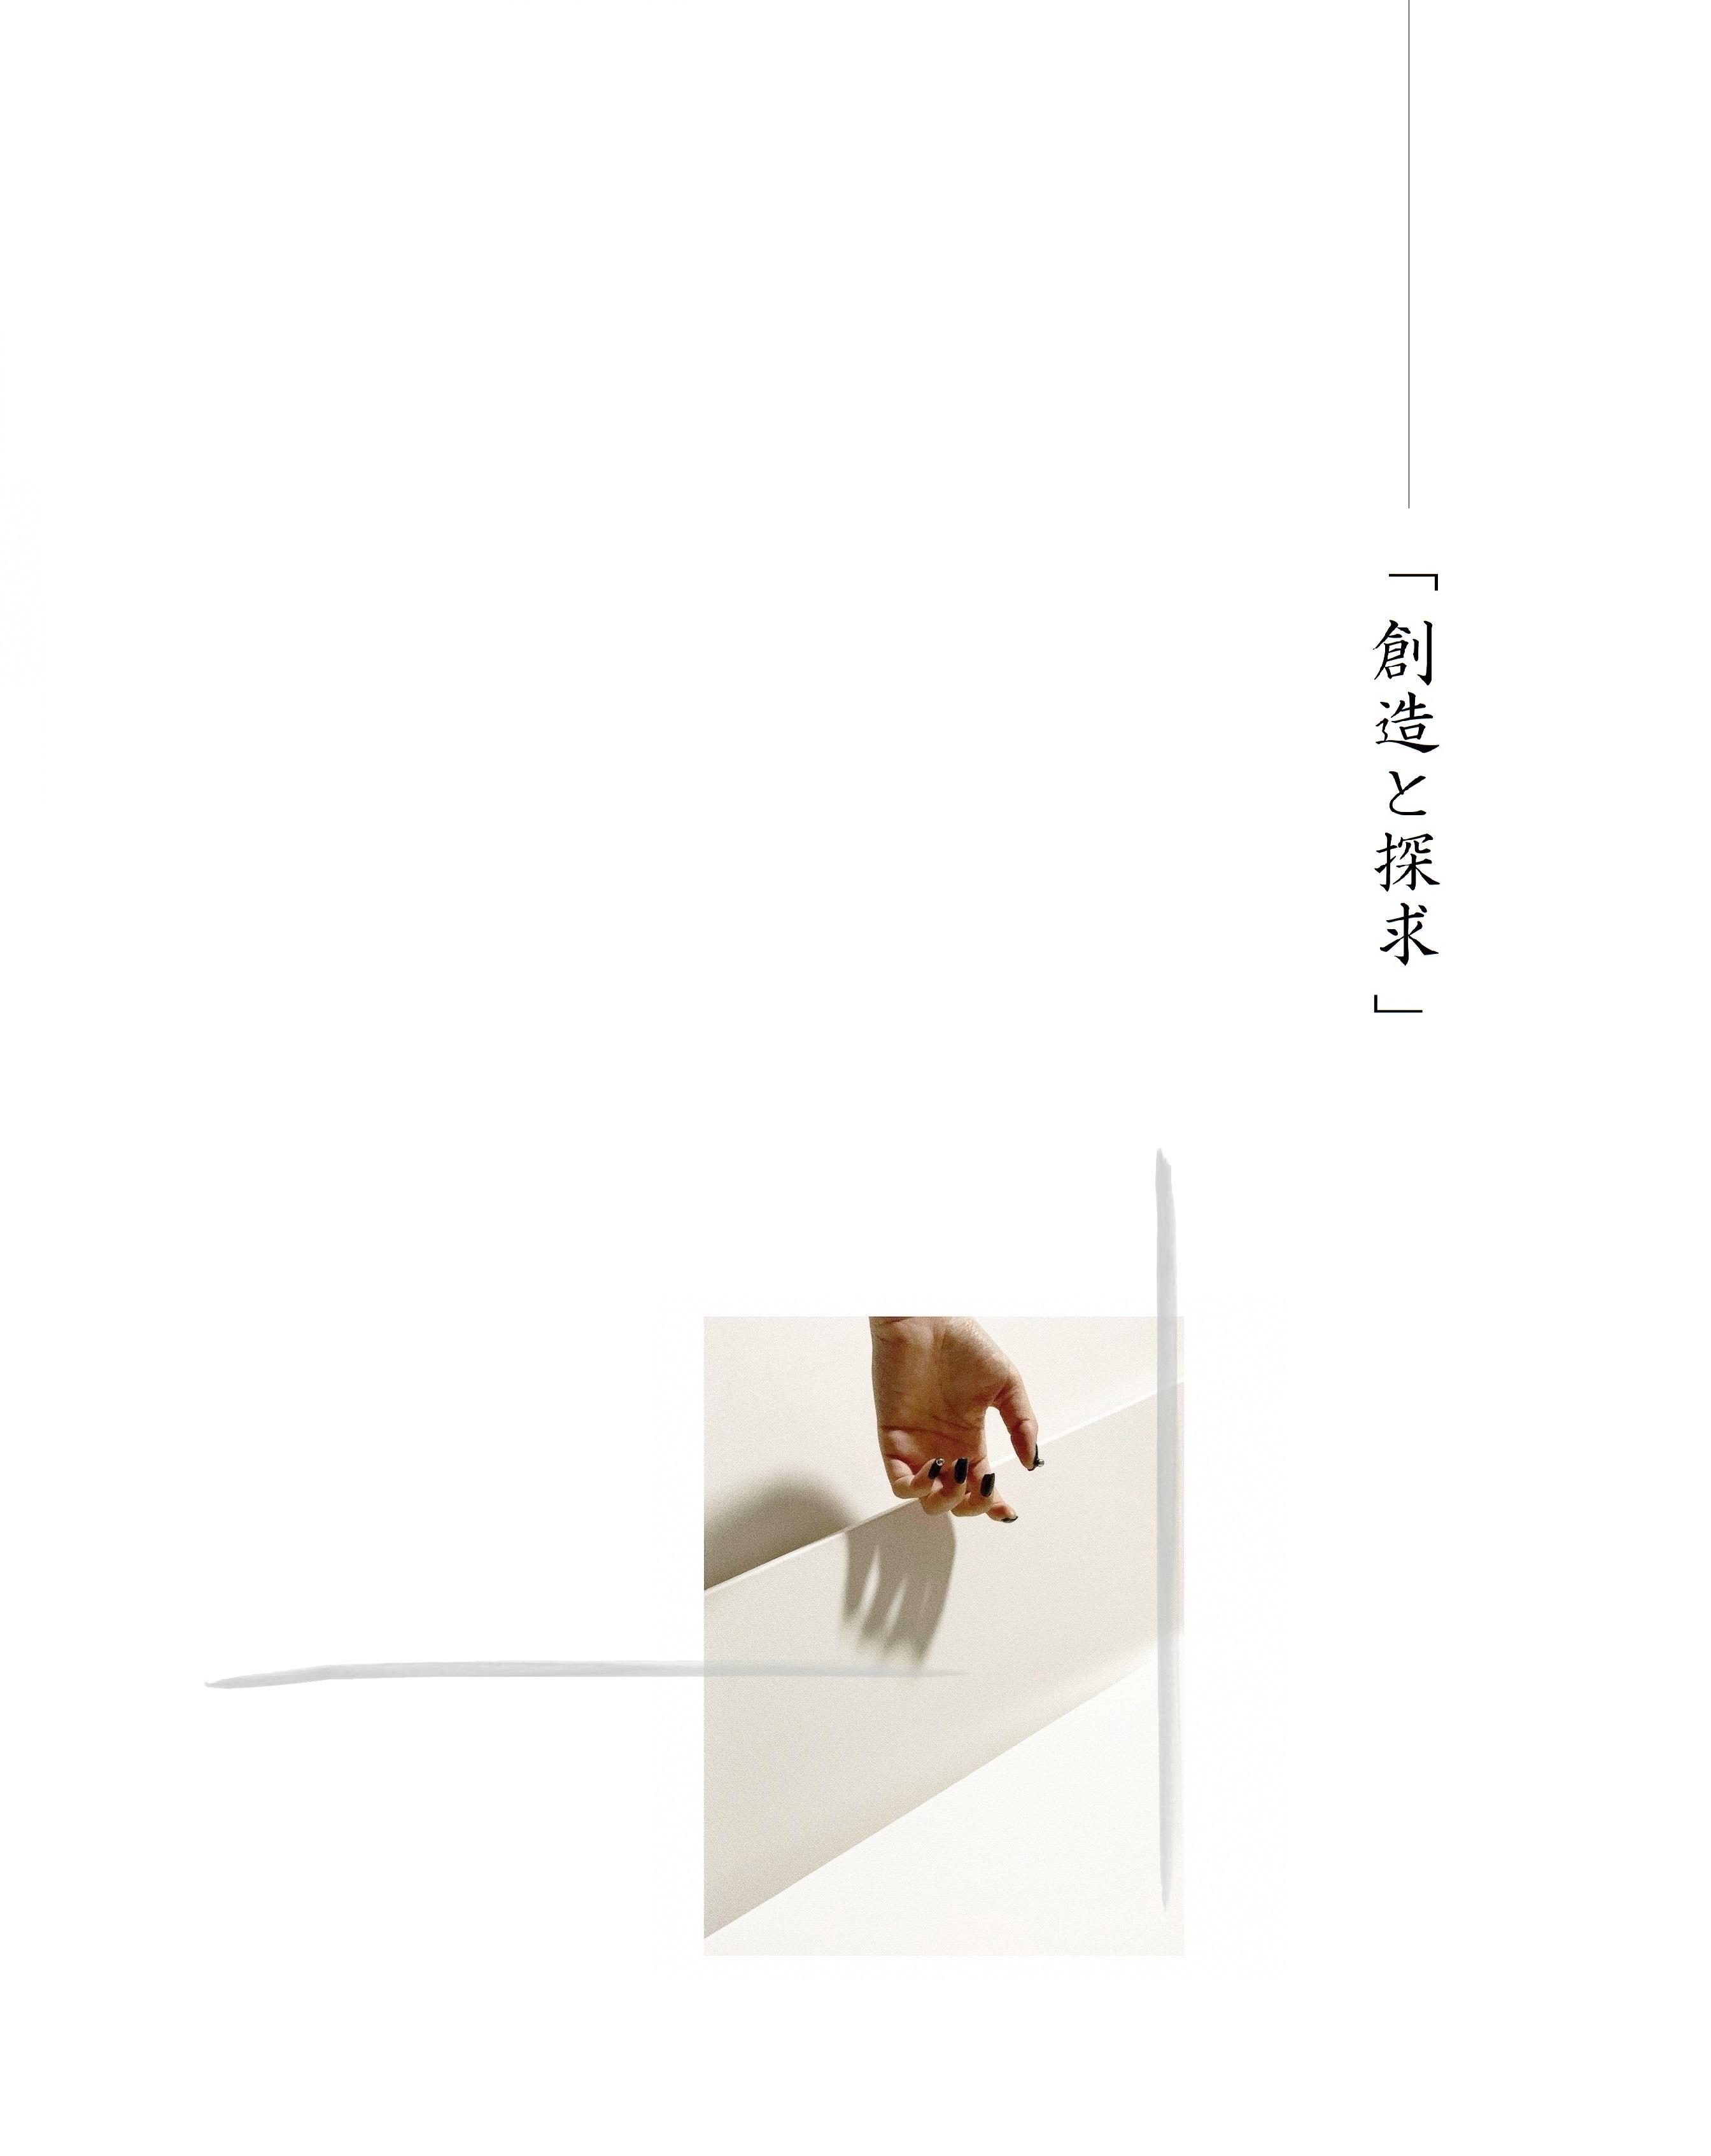 PHOTON 作品 撮影 │ PHOTON ( フォトン )│private nail art lab Tokyo│ プライベート ネイル サロン │東京